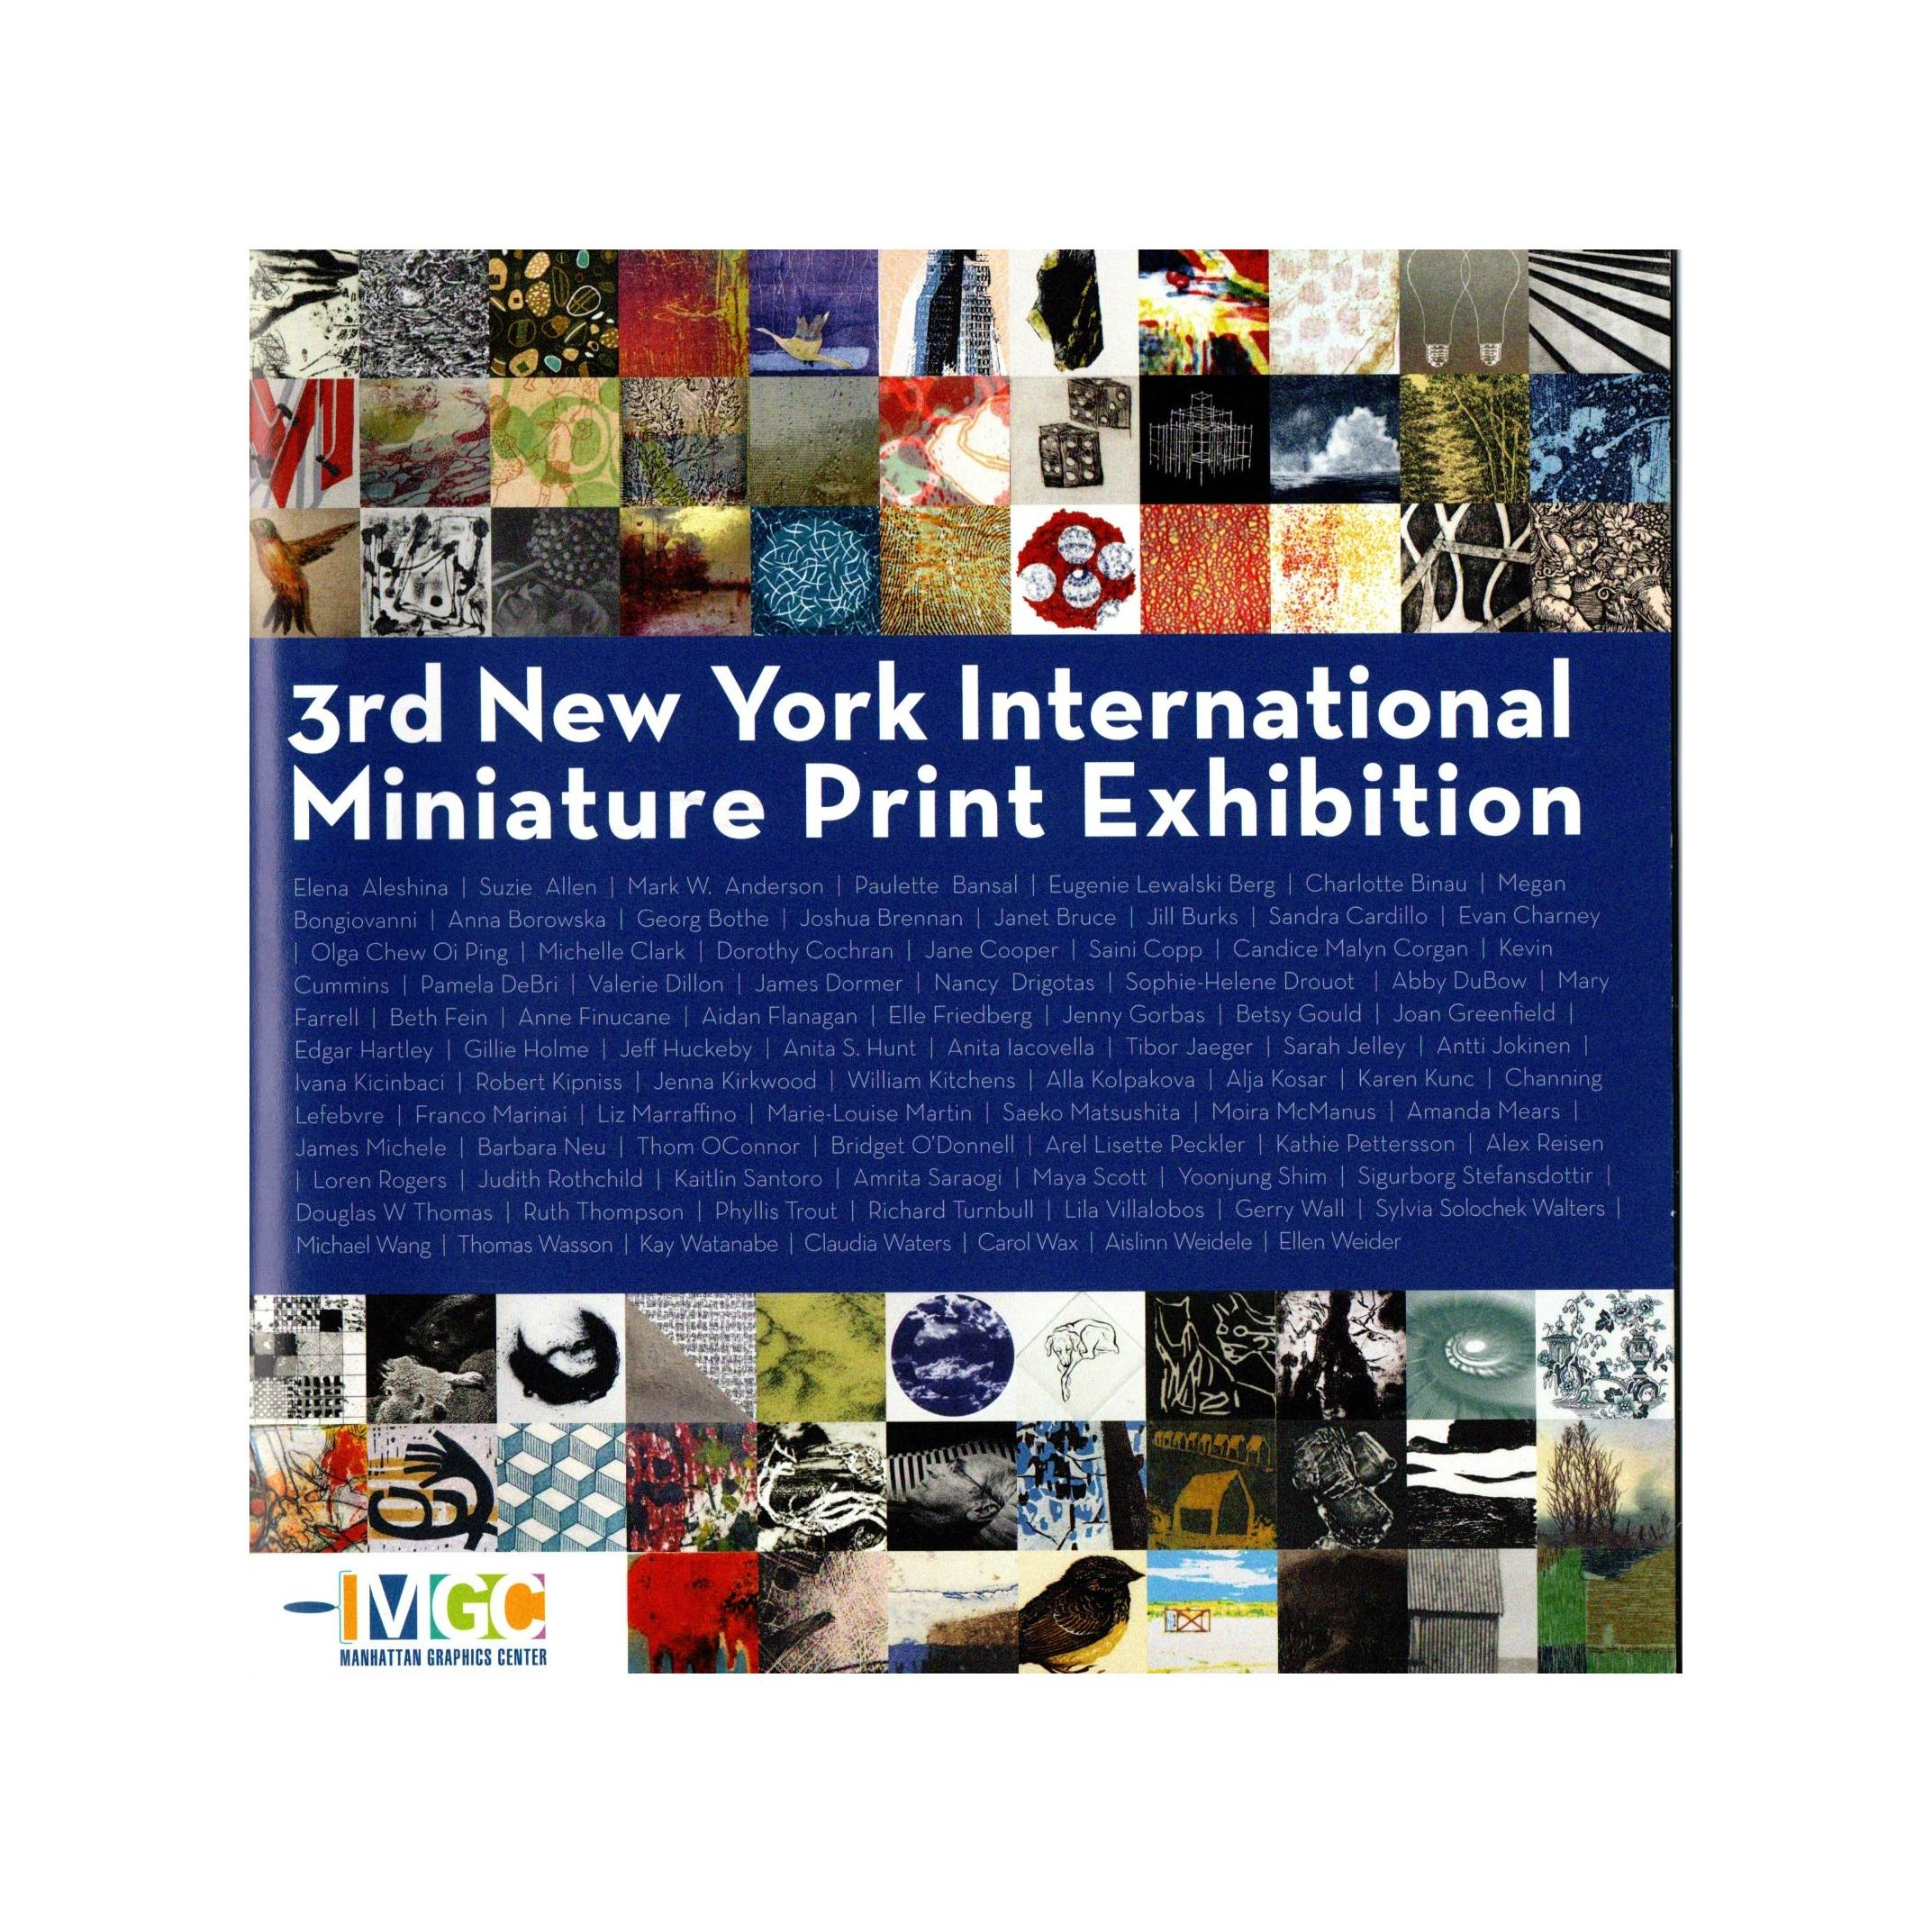 3rd New York International Miniature Print Exhibition, Manhattan Graphics Center, New York, USA